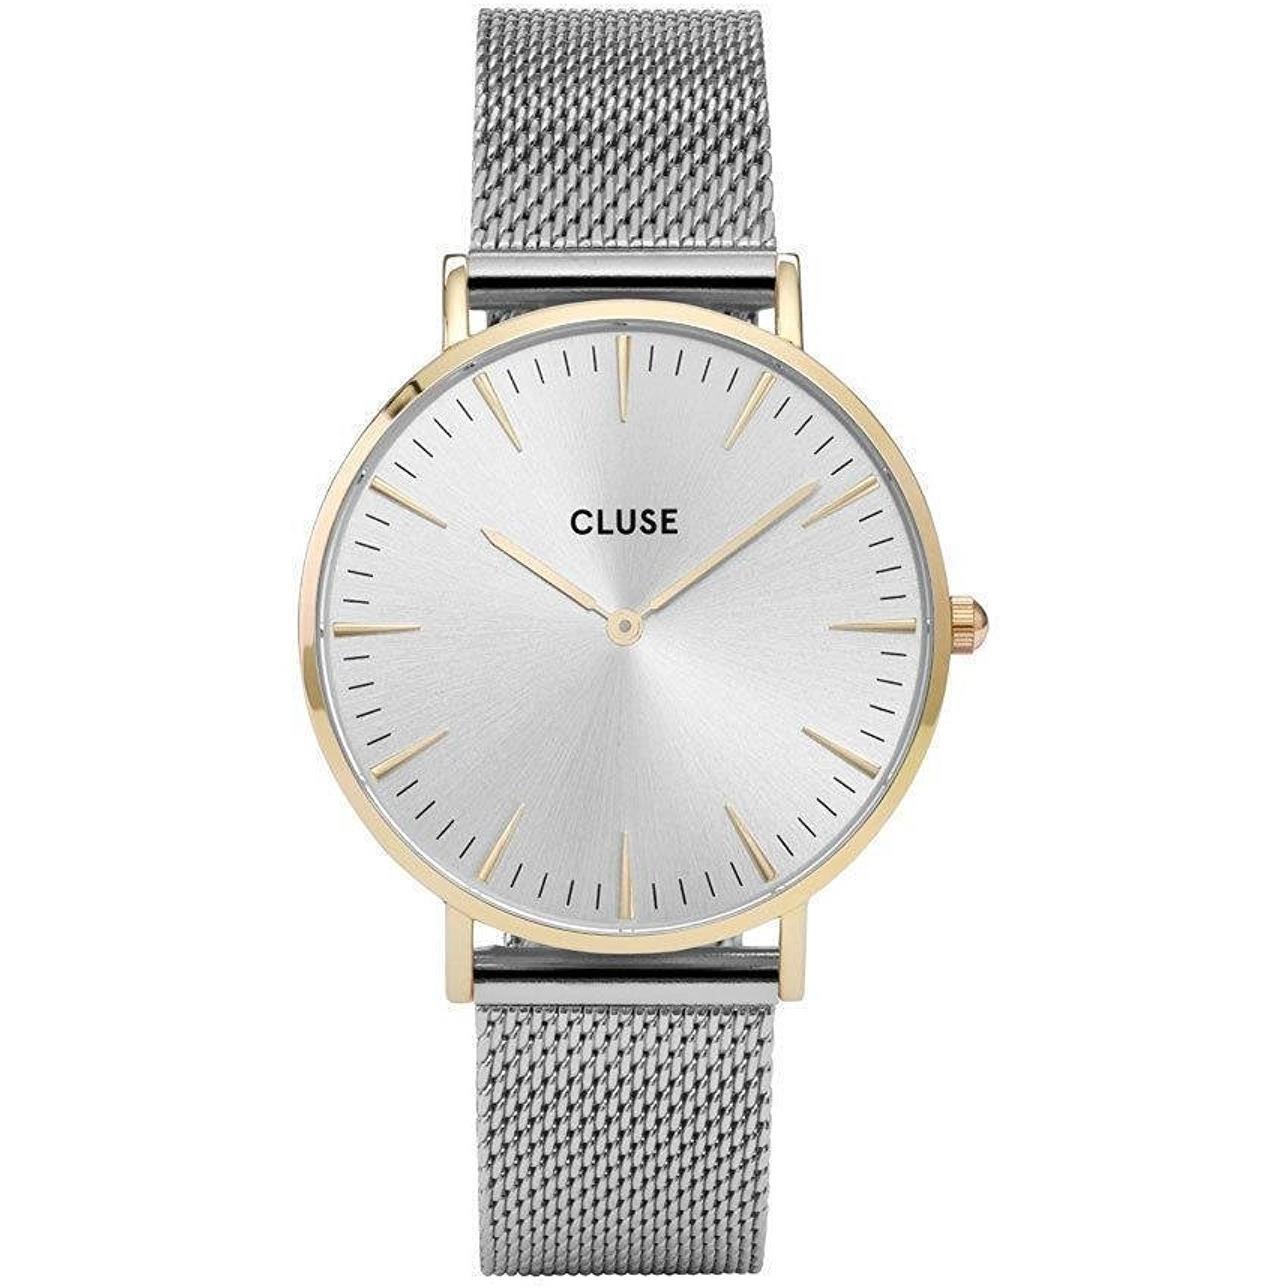 Amazon.com  CLUSE La Bohème Mesh Gold Silver CL18115 Women s Watch 38mm  Stainless Steel Strap Minimalistic Design Casual Dress Japanese Quartz  Elegant ... eeee643deba